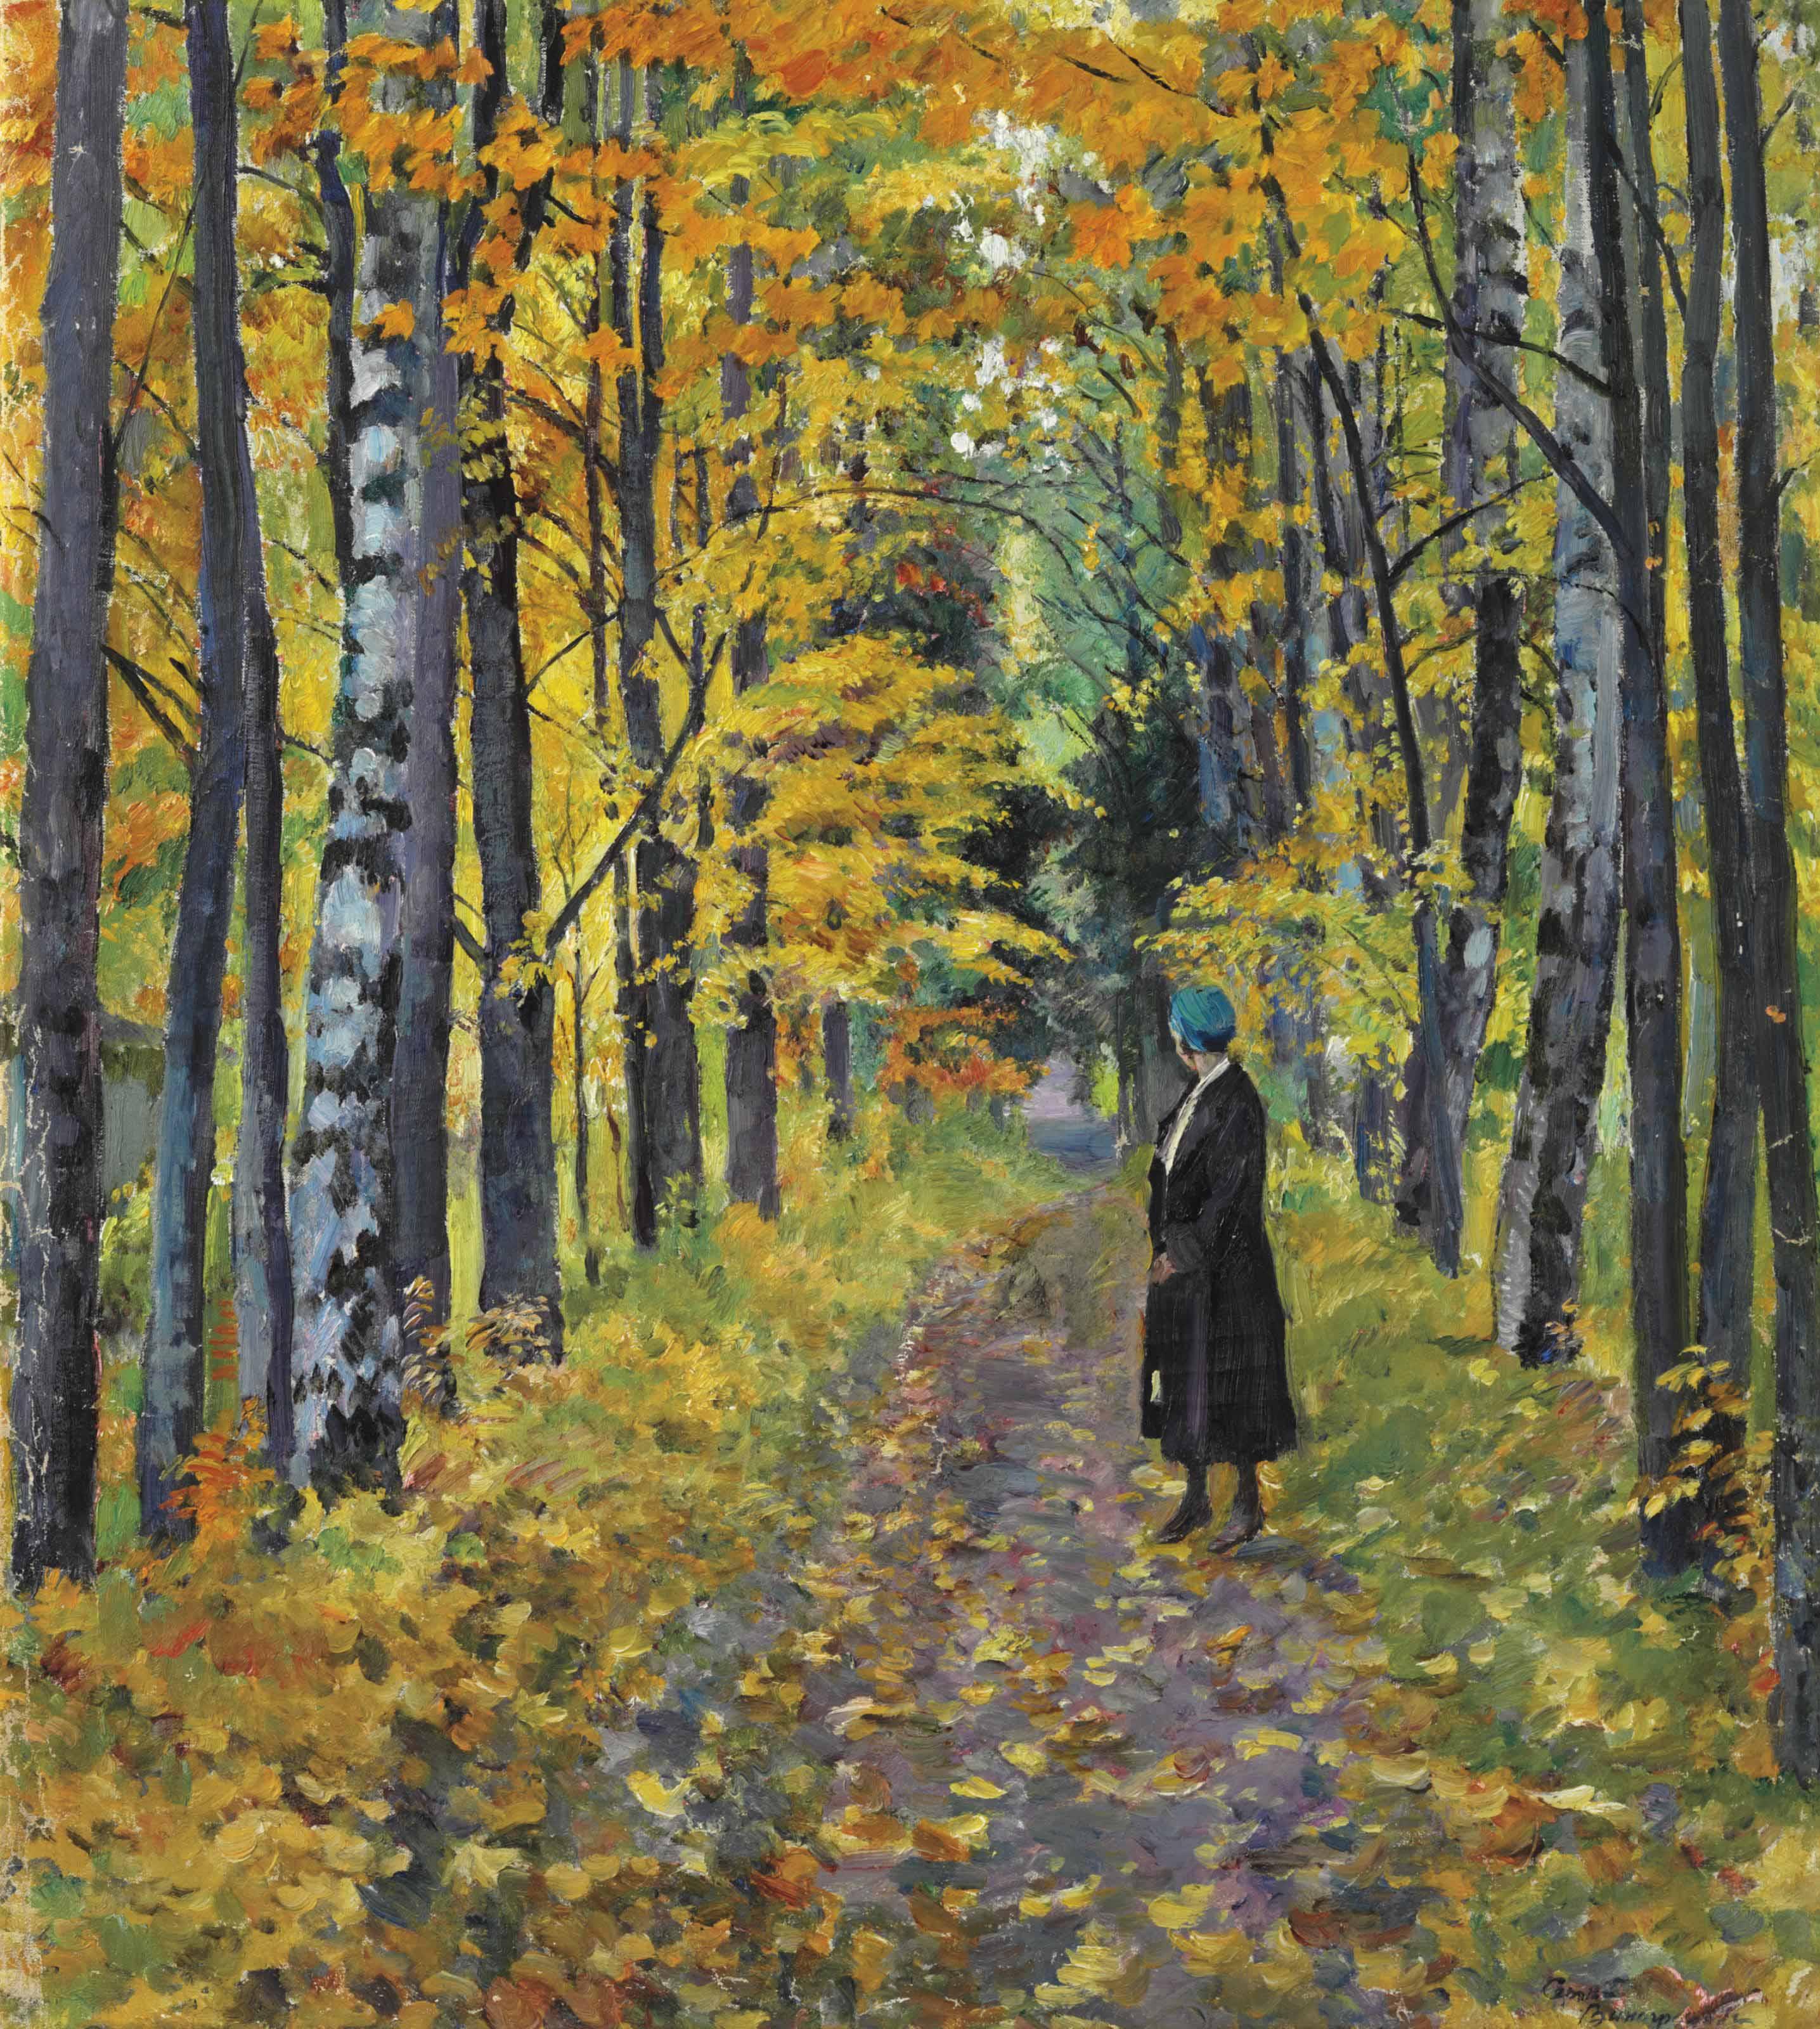 A walk through the woods in autumn